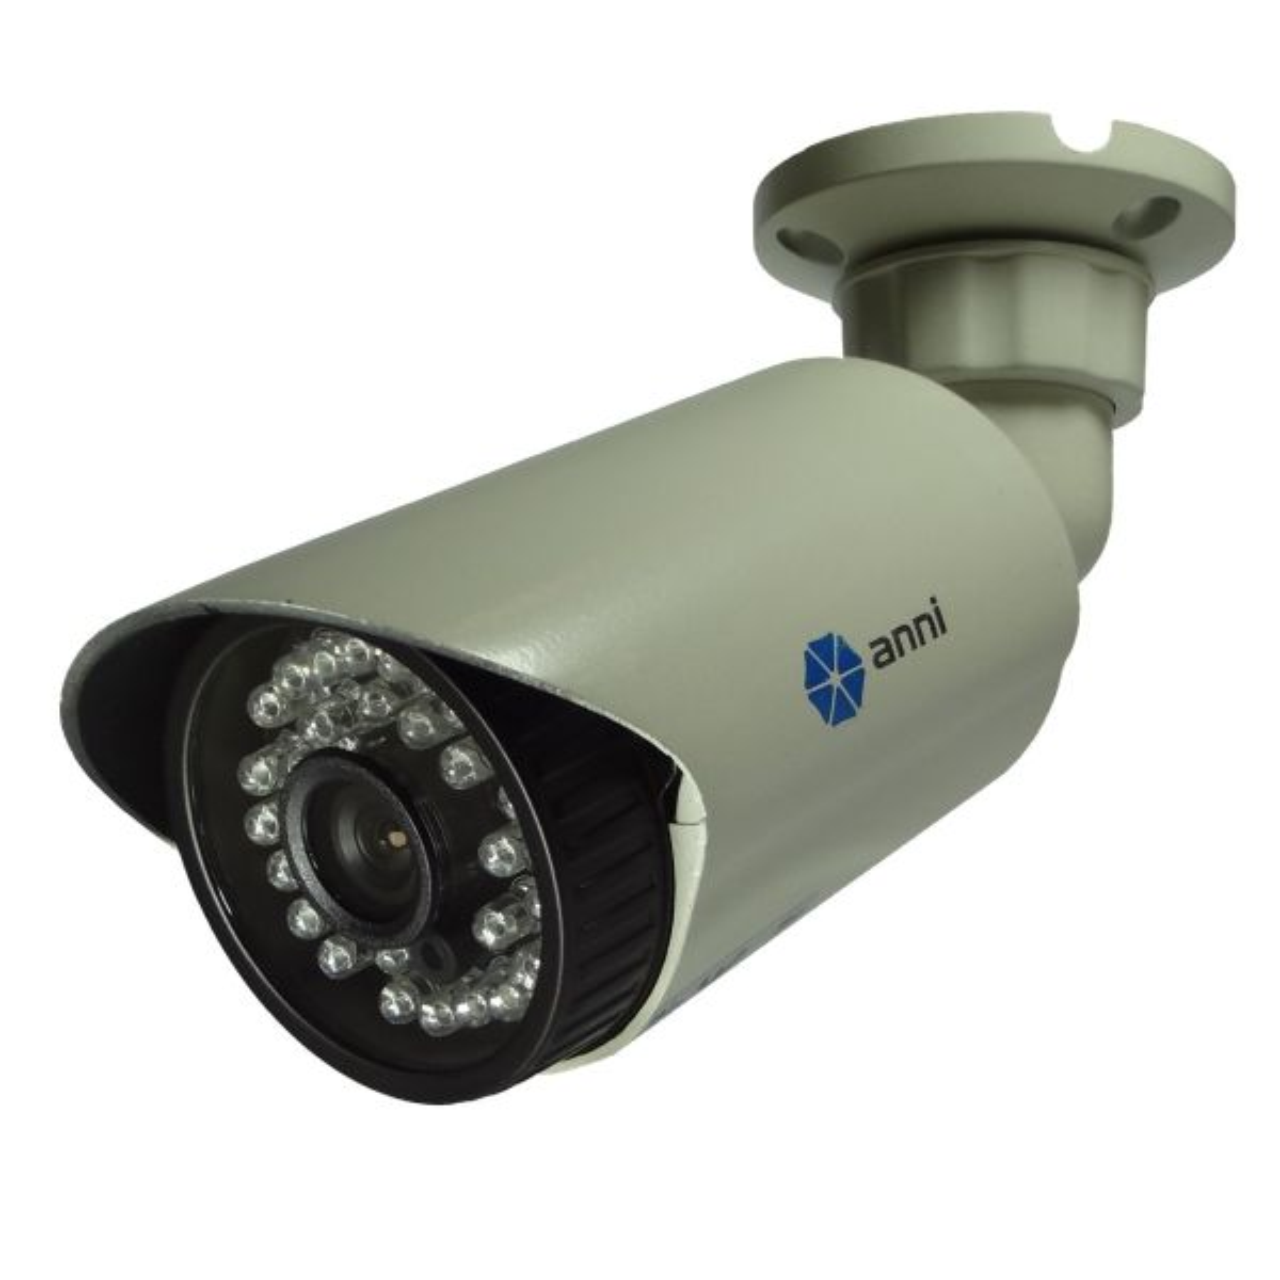 دوربین تحت شبکه آنی مدل 3F19EP